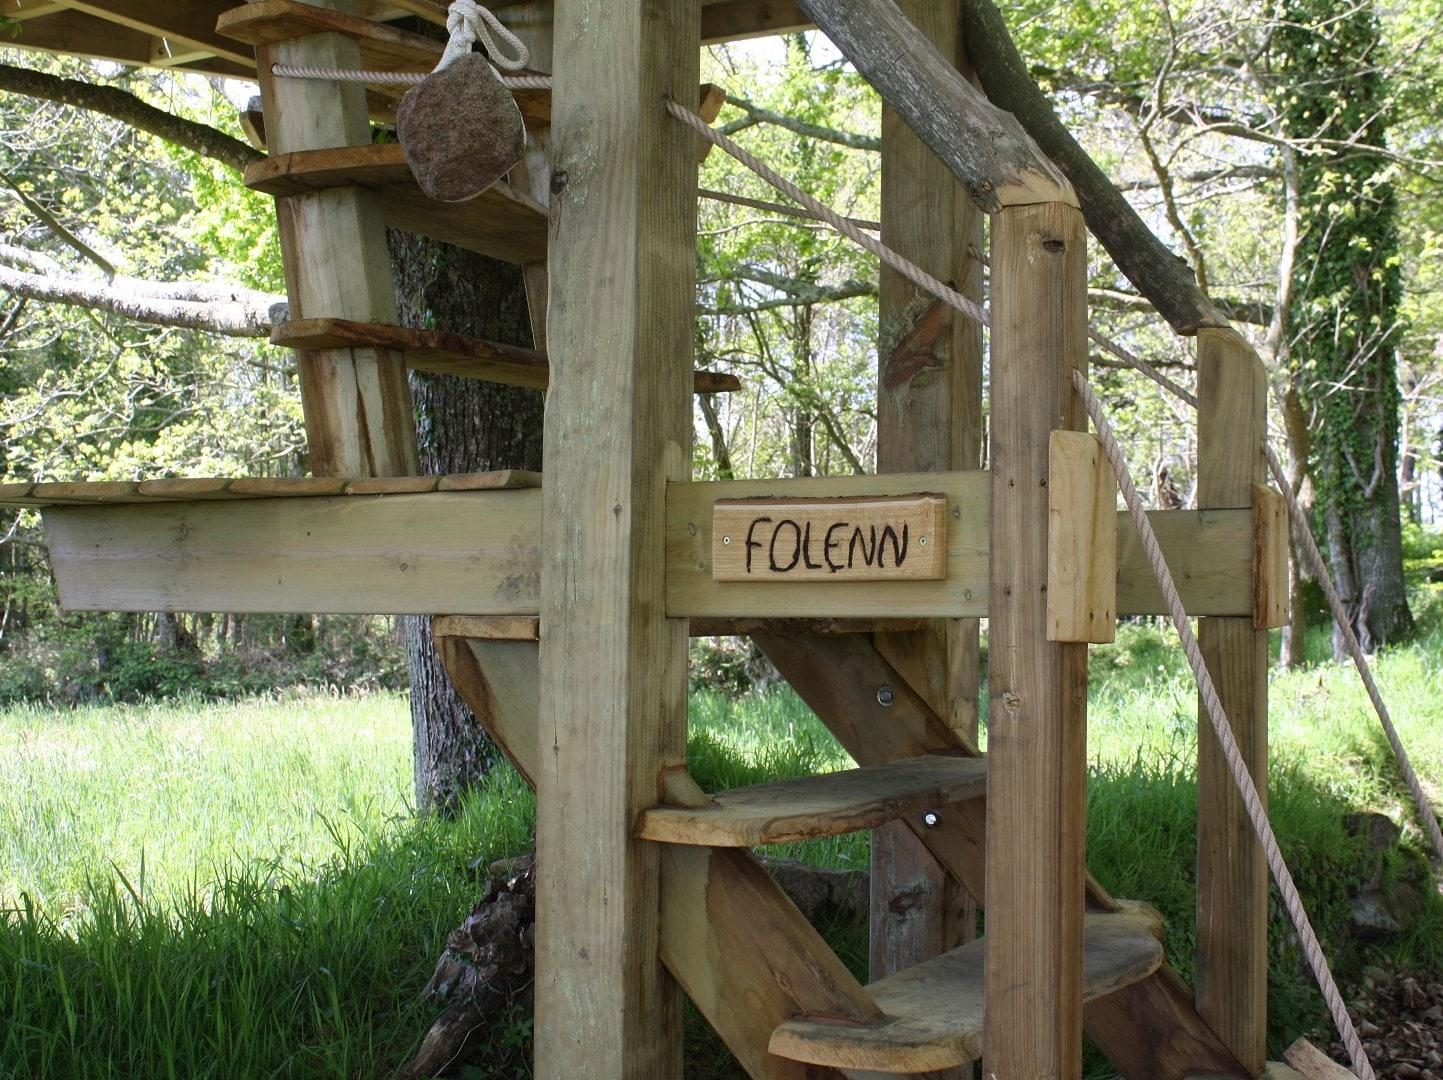 cabane perchée bretagne - Folenn